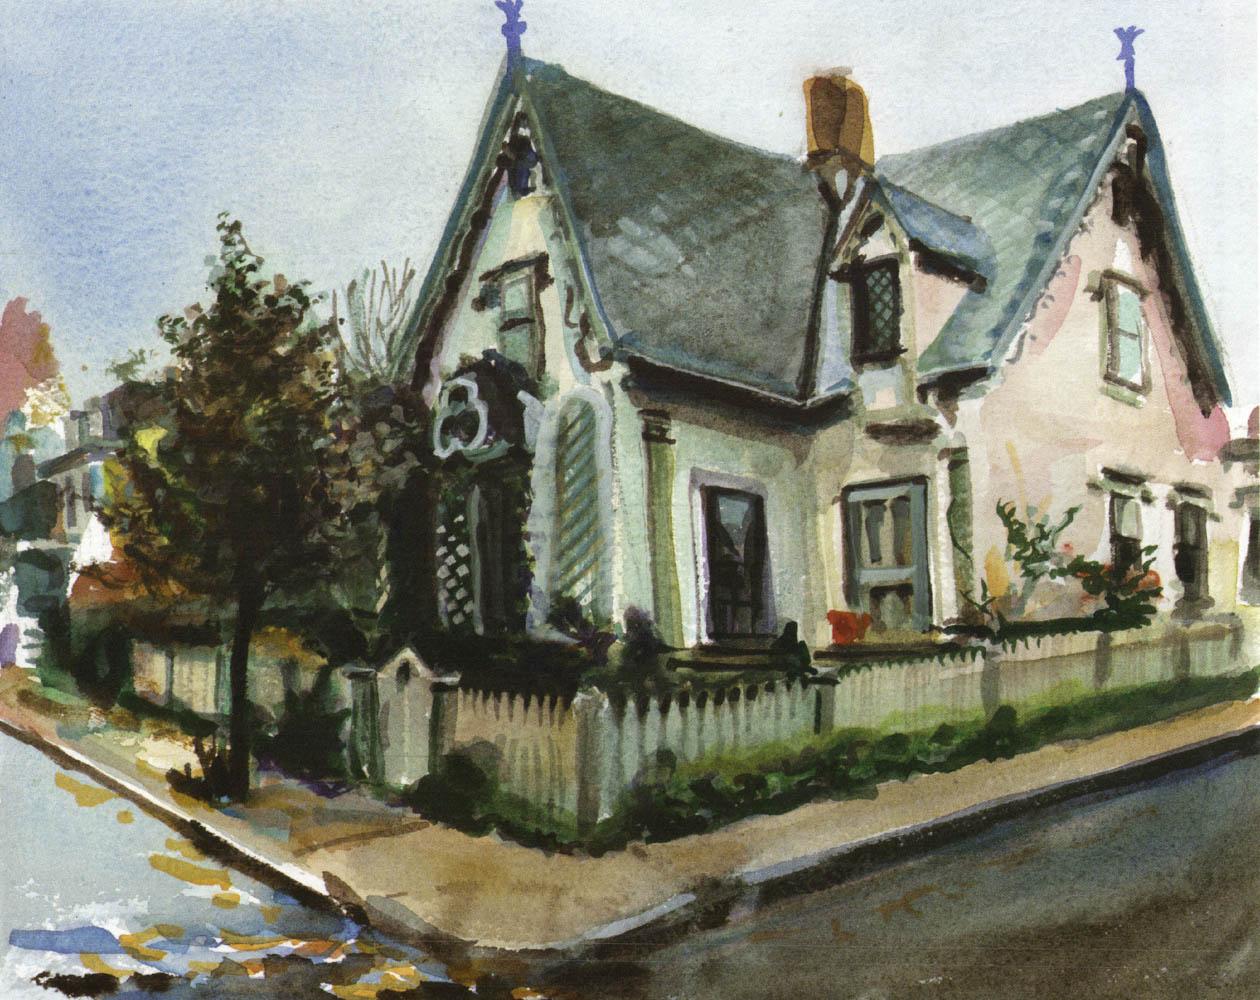 The Benjamin Marsh House, damp afternoon light, Fall 1997